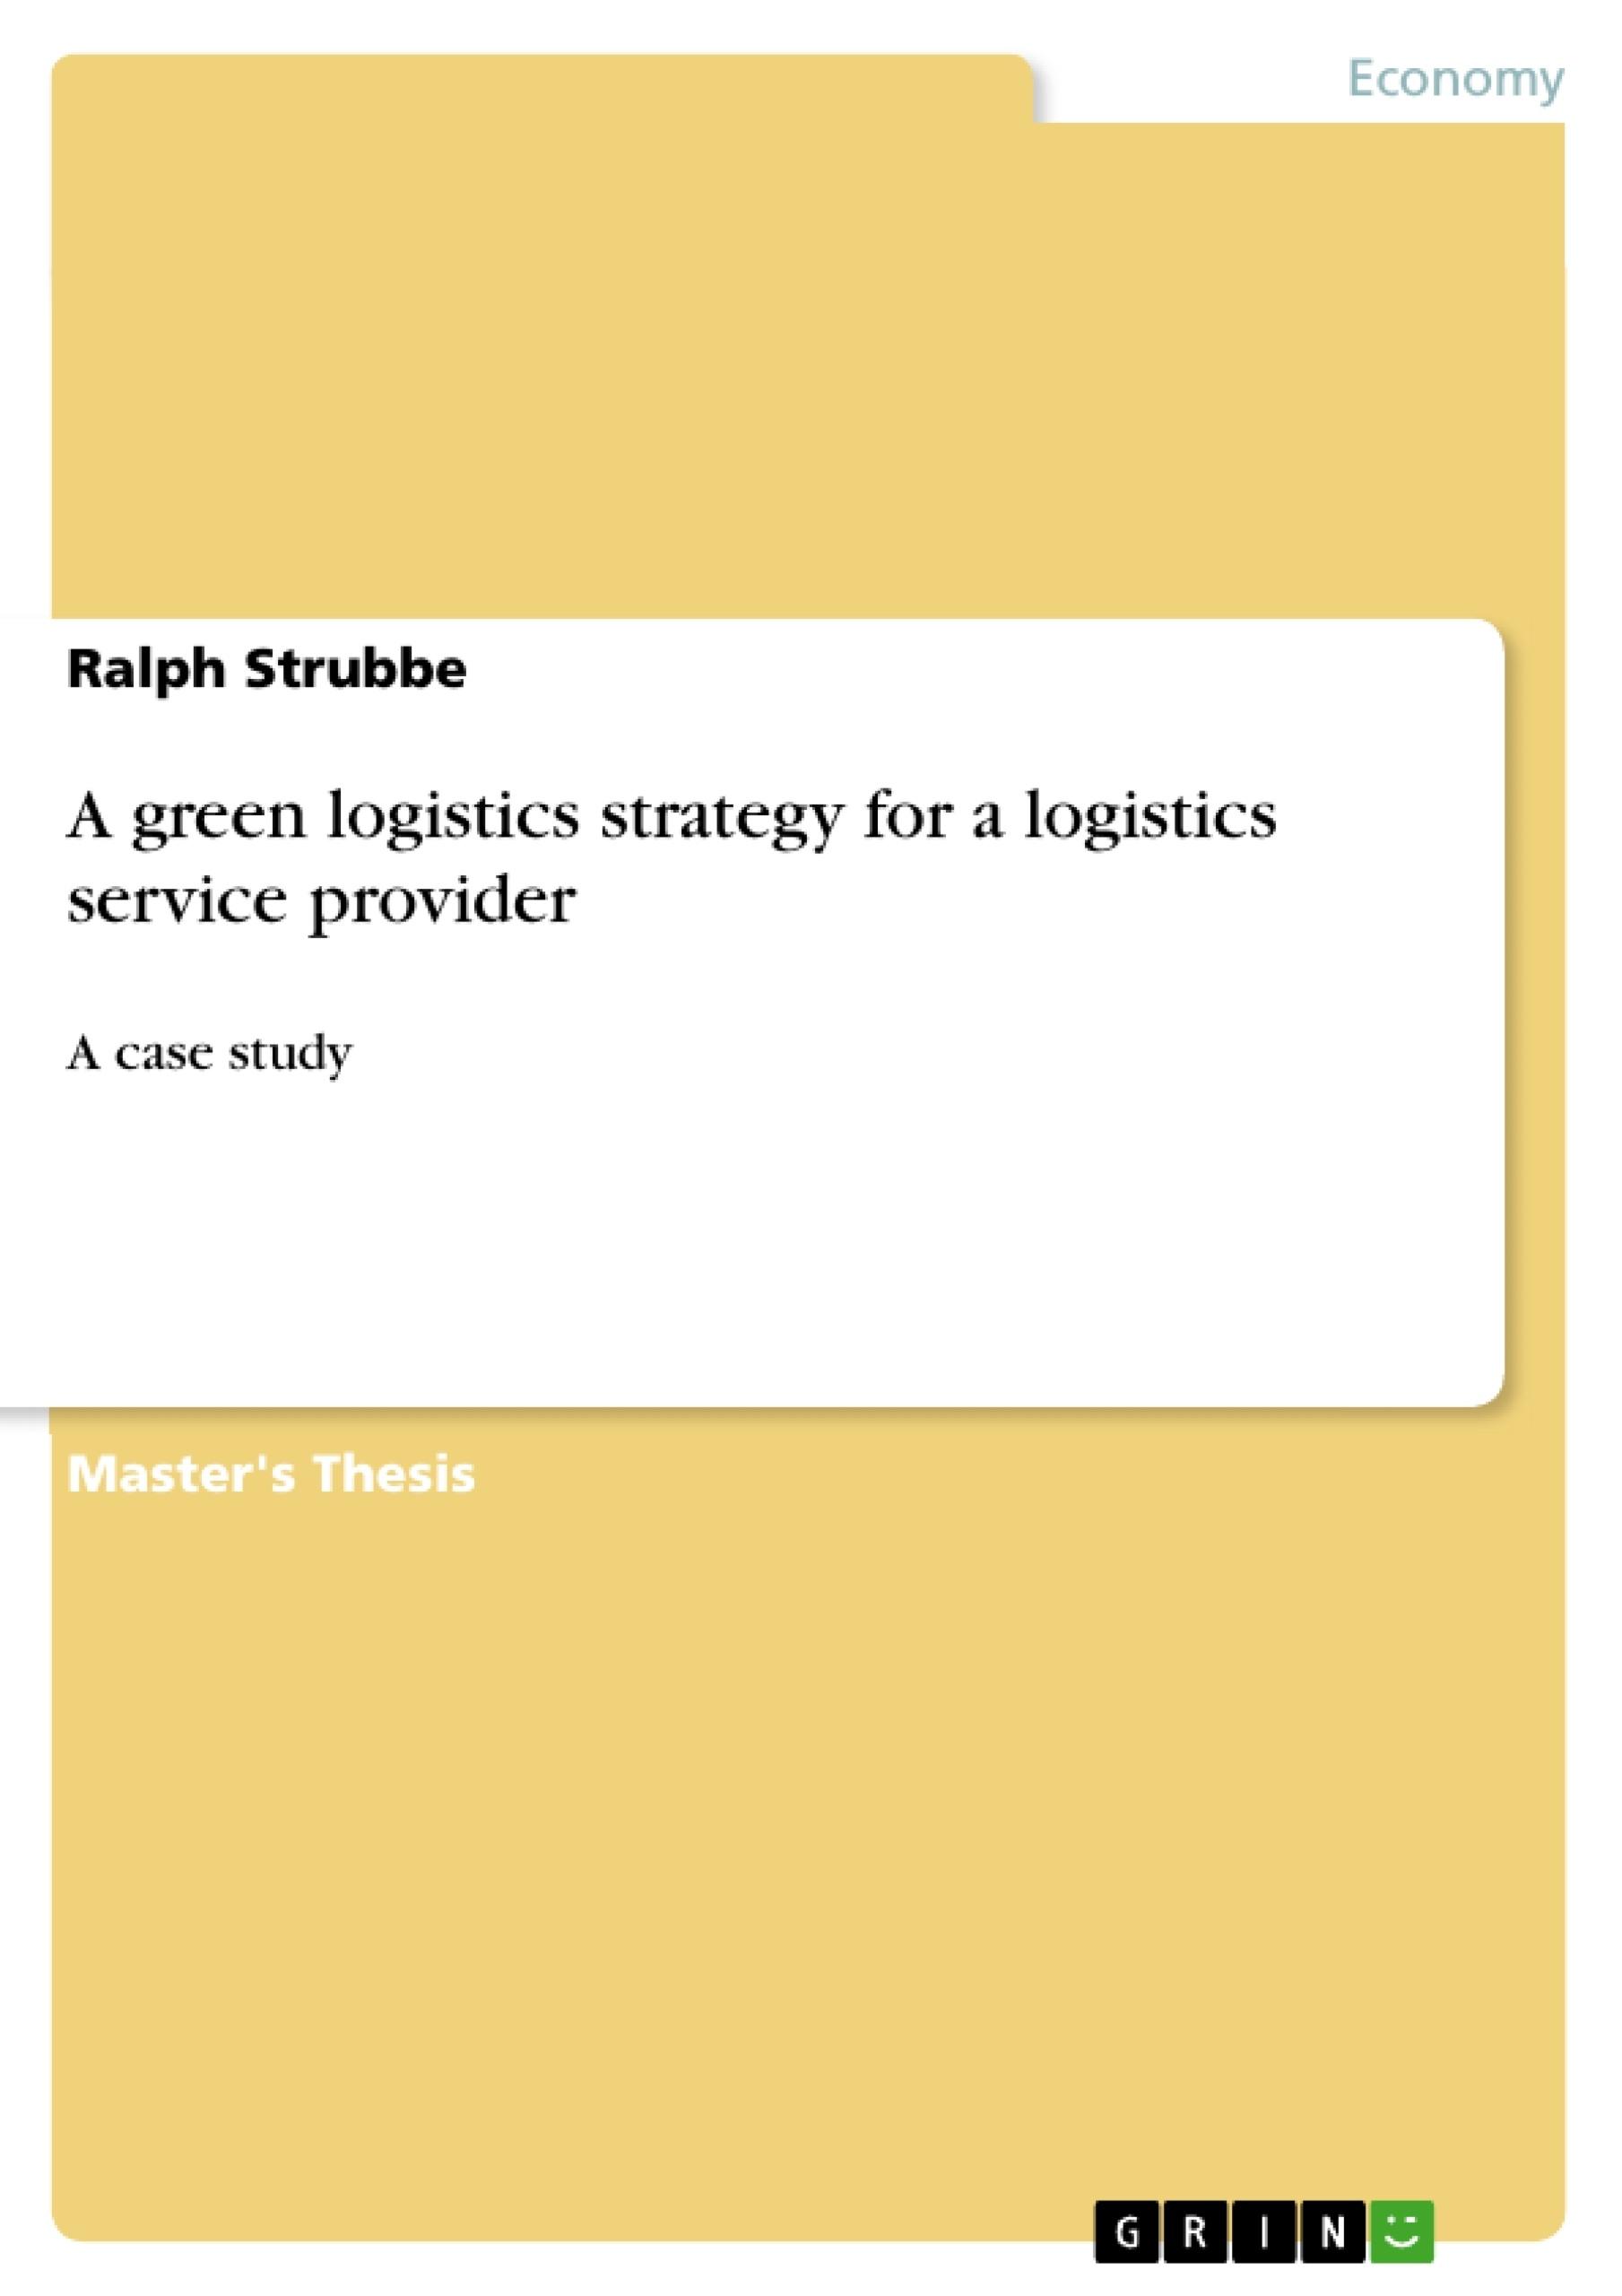 Title: A green logistics strategy for a logistics service provider